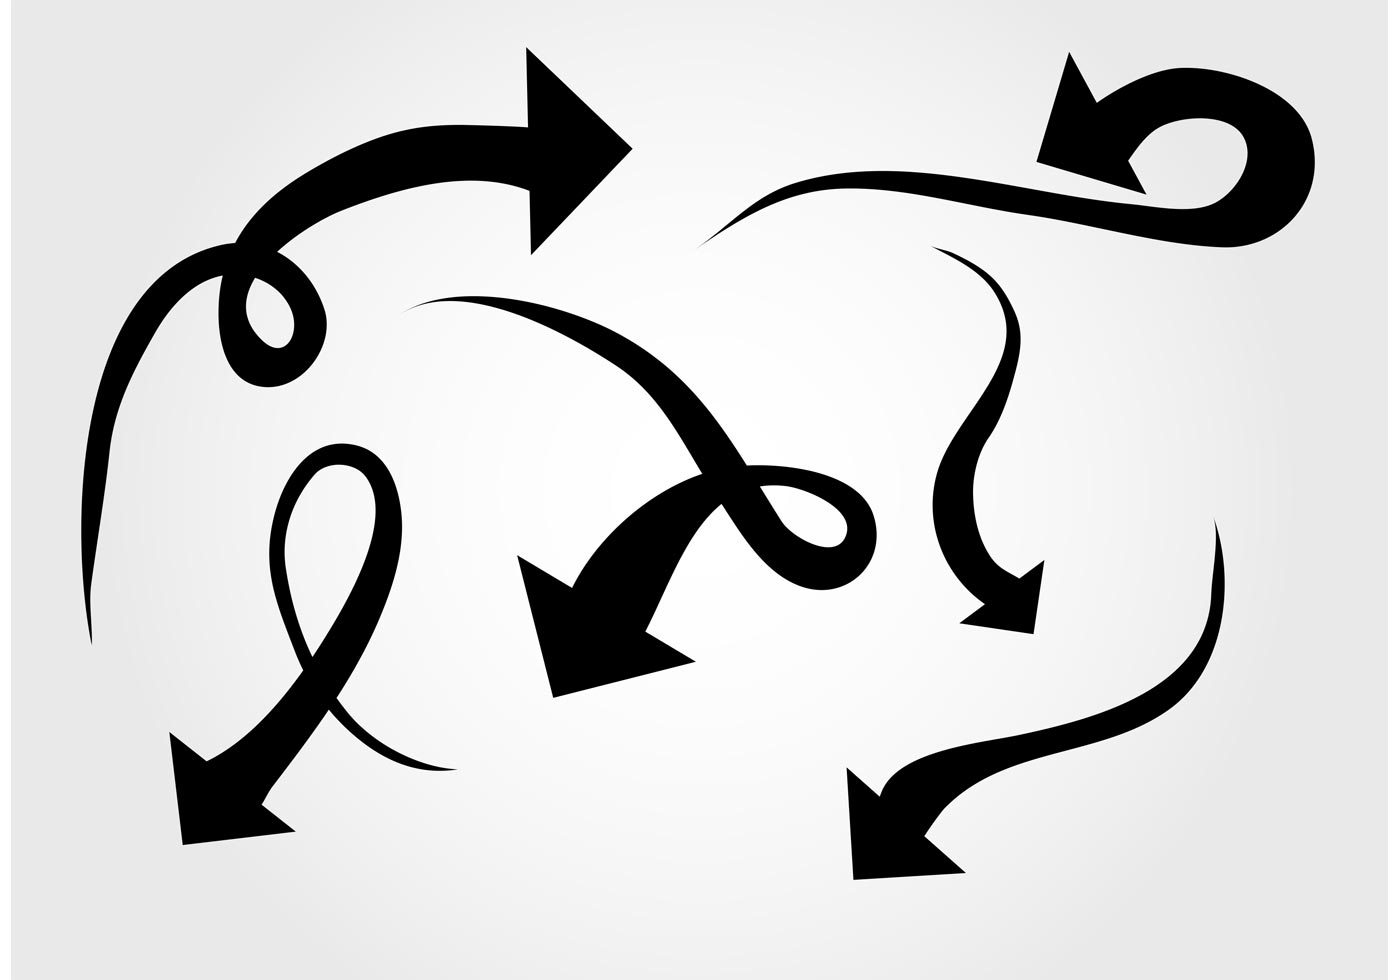 Cycle arrow clipart coreldraw clip art Arrow Free Vector Art - (3683 Free Downloads) clip art